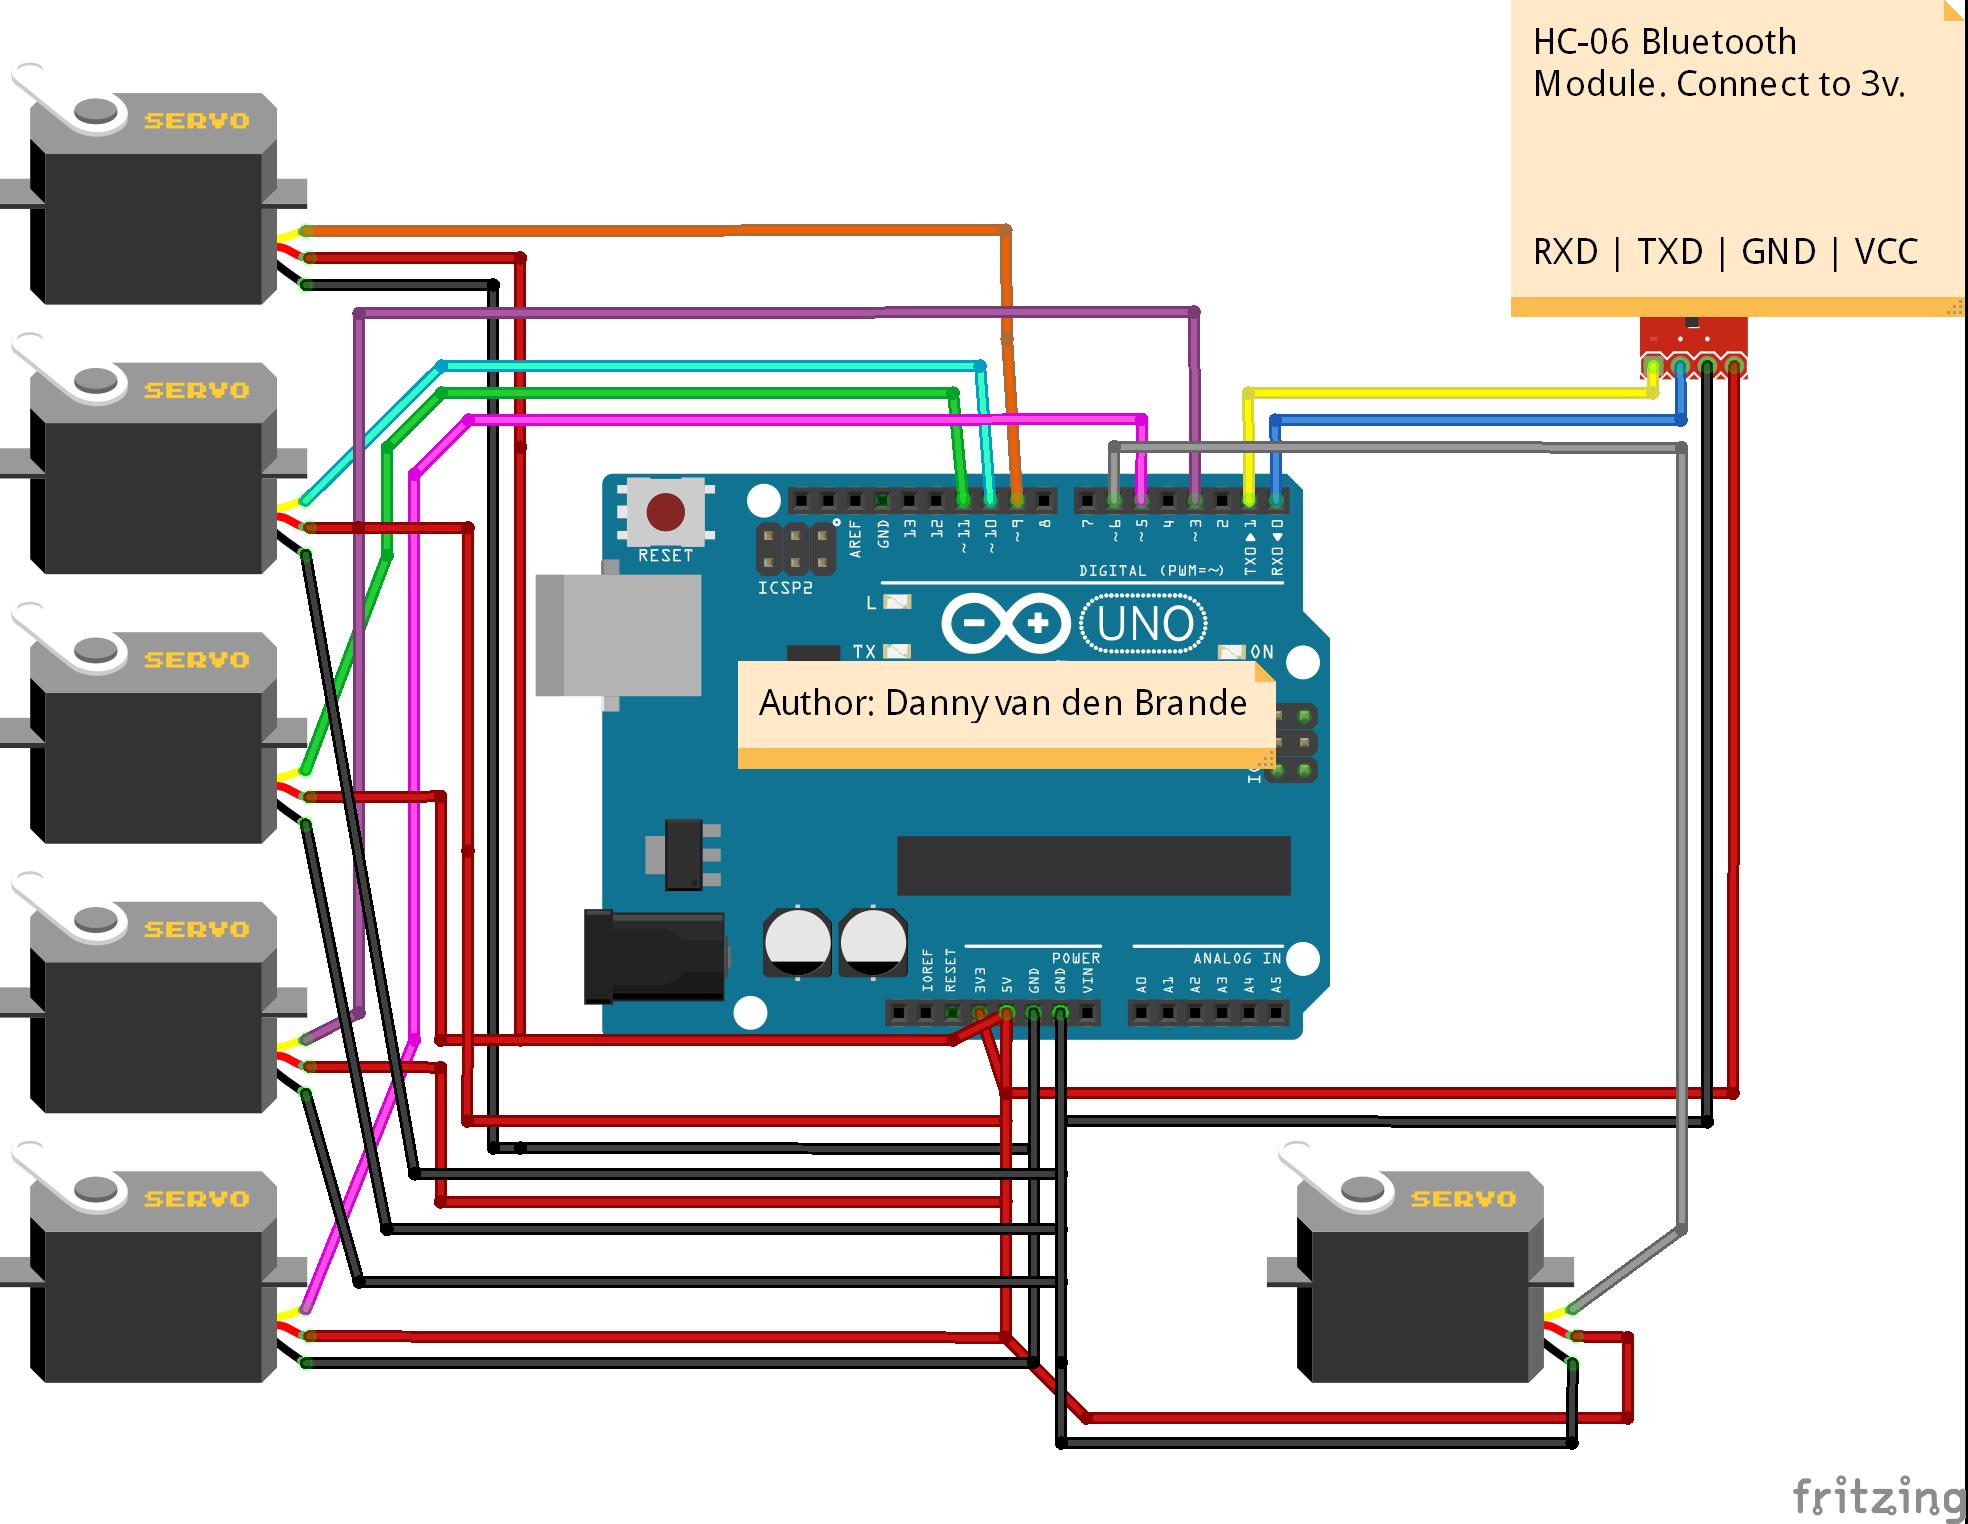 Arduinoandroid Bluetooth Multi Servo Motor Control Hacksteriorhhacksterio: Arduino Bluetooth Module Schematic At Gmaili.net